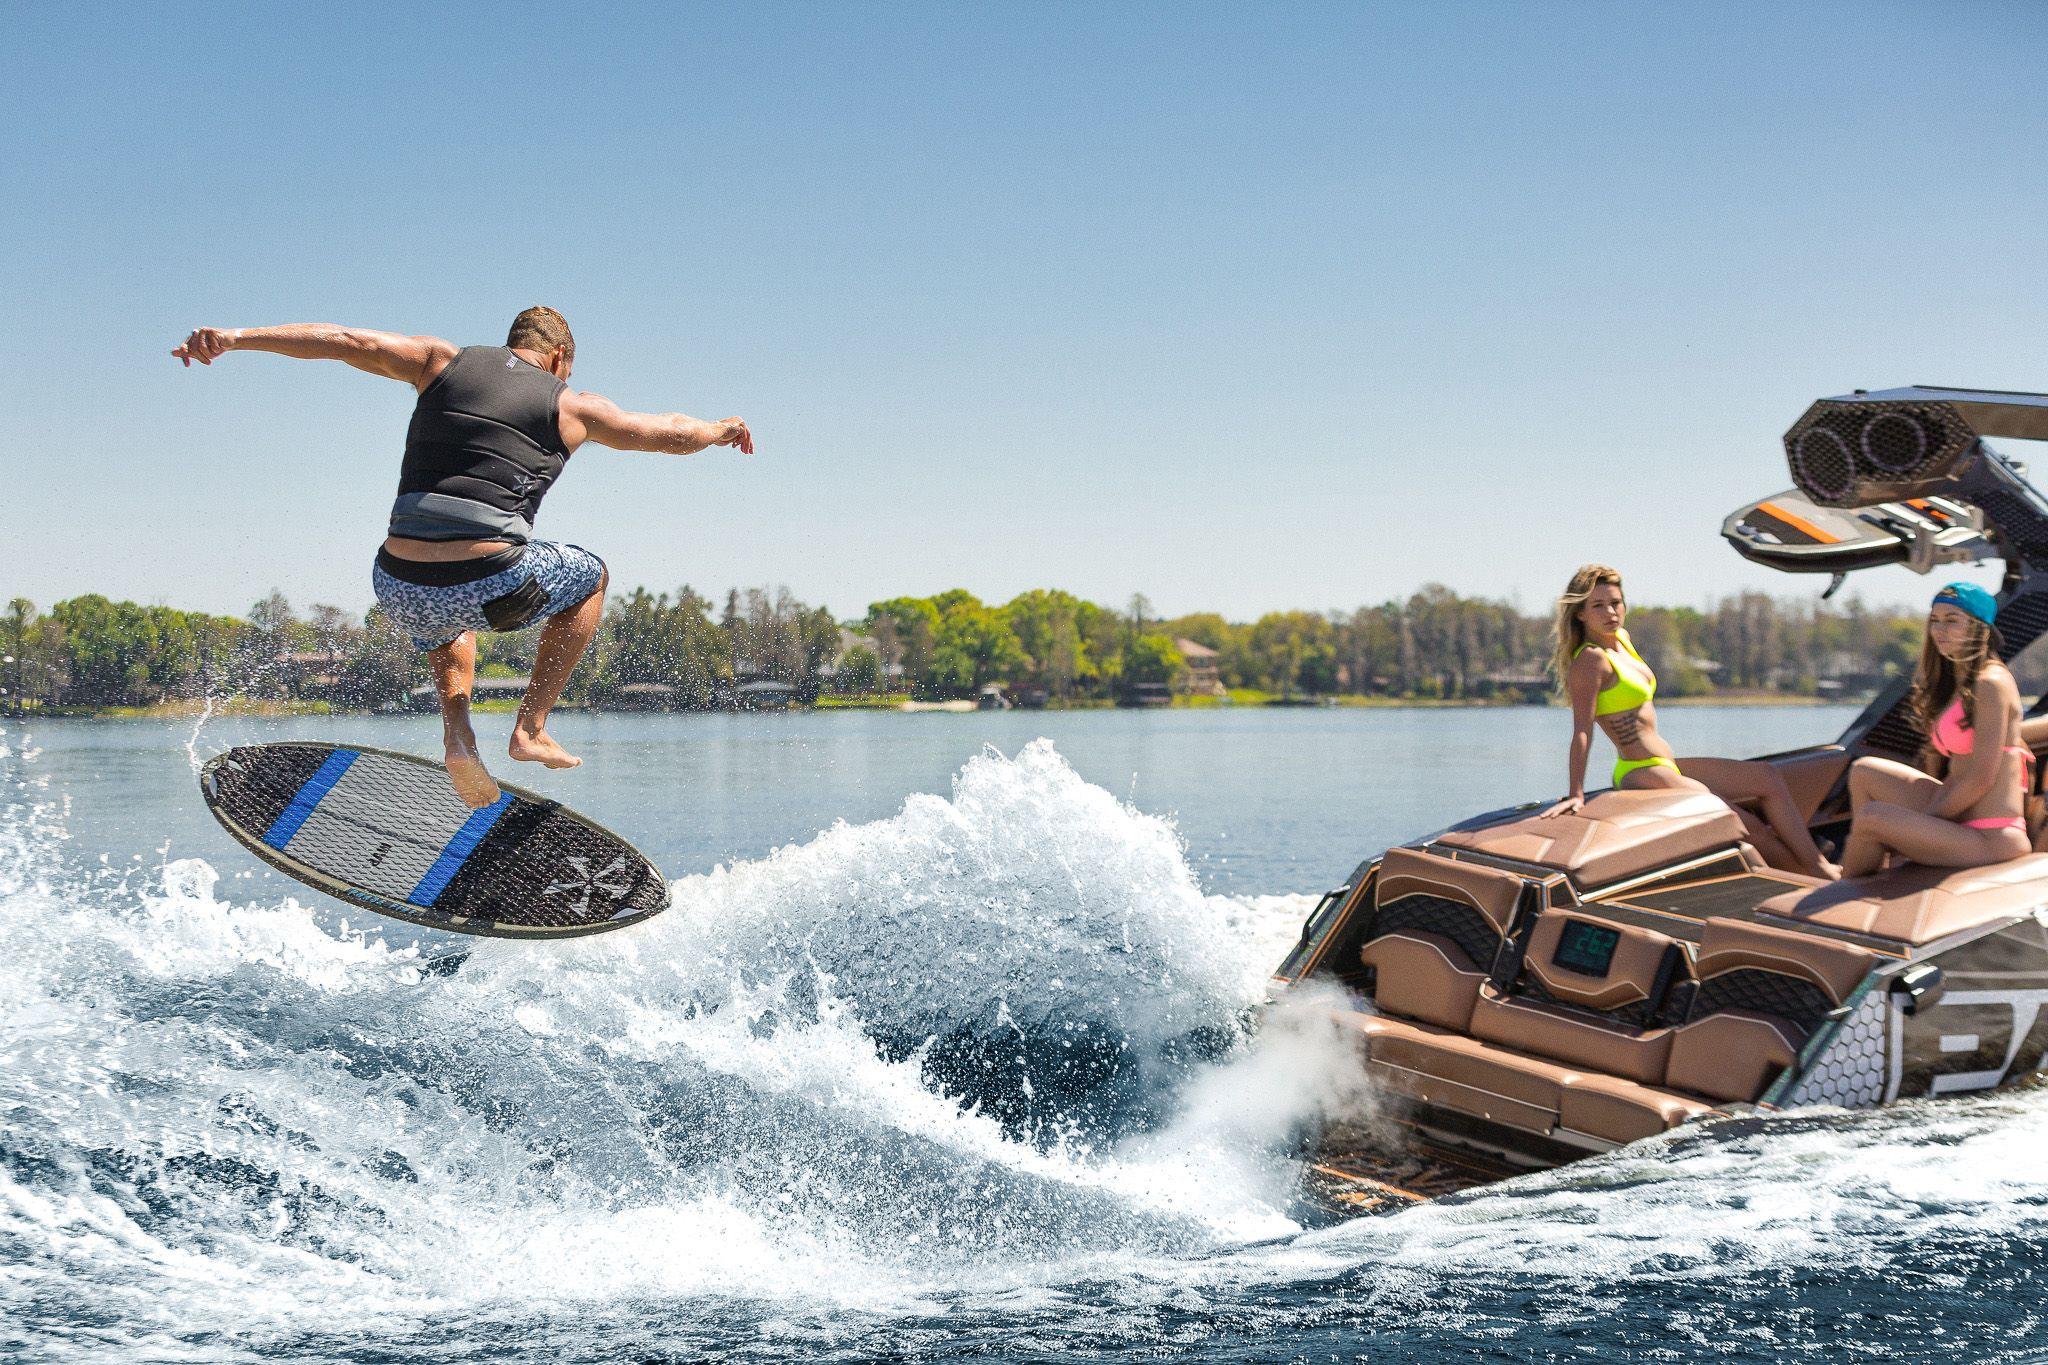 About Us Fresh Air Exhaust Wake Surfing Surfing Malibu